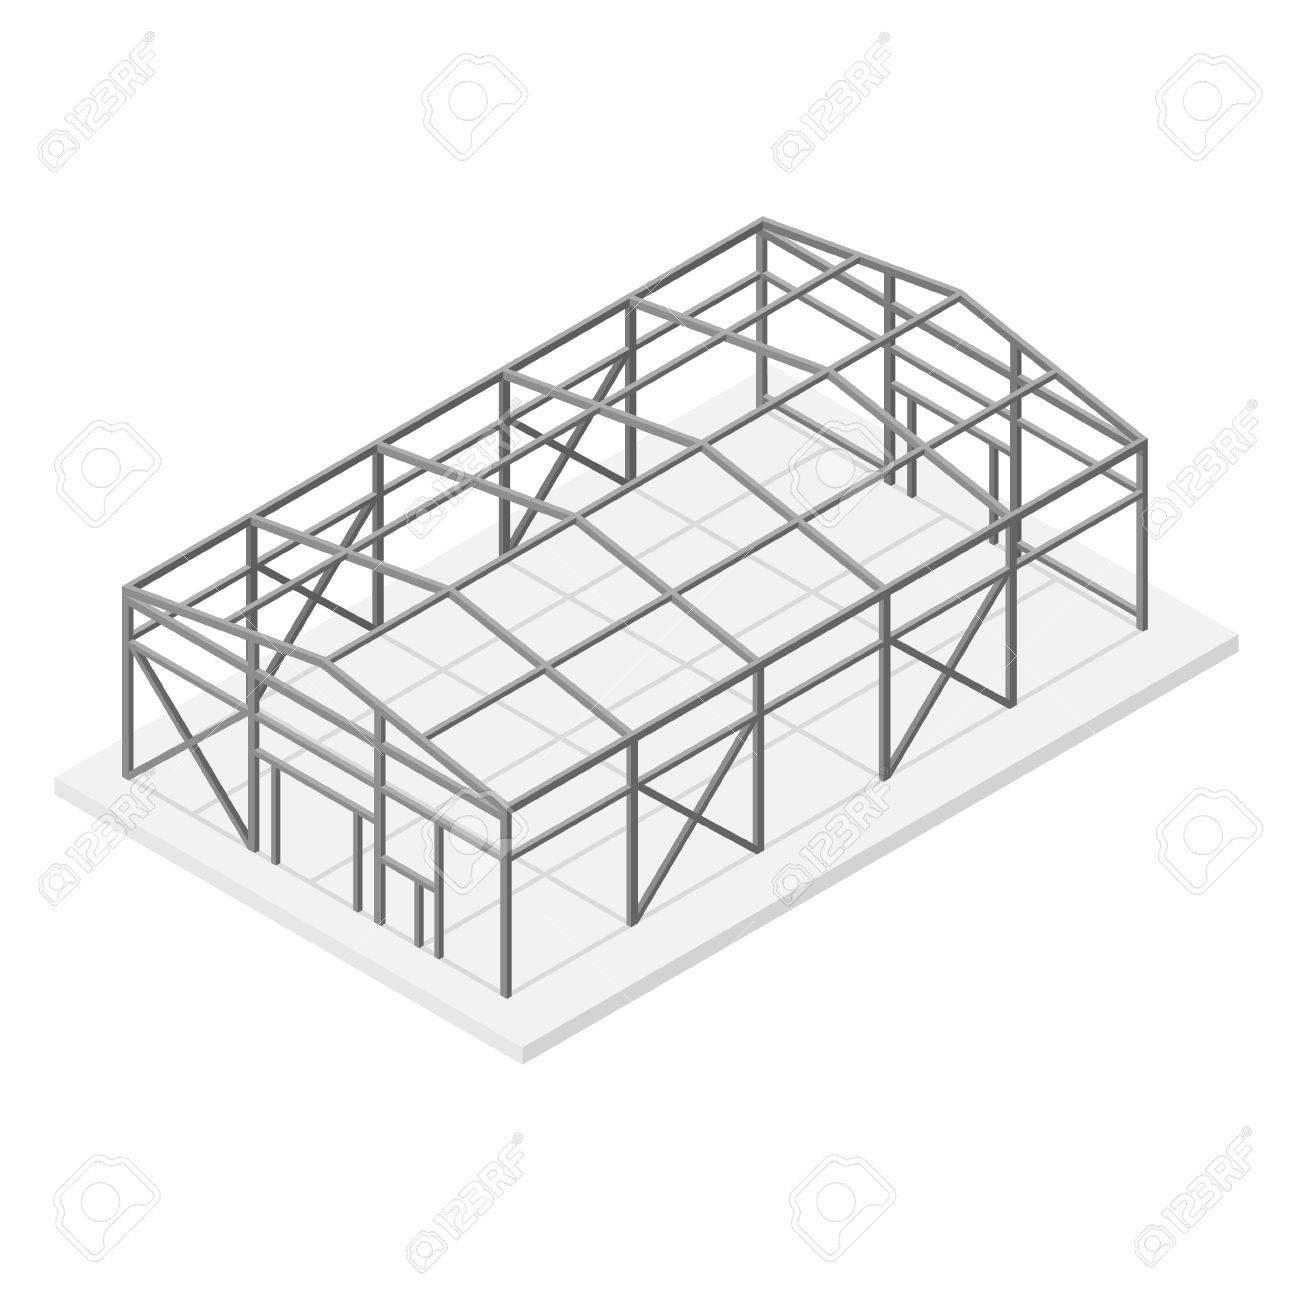 1300x1300 Building Hangar Or Warehouse Metal Construction Frame Roof